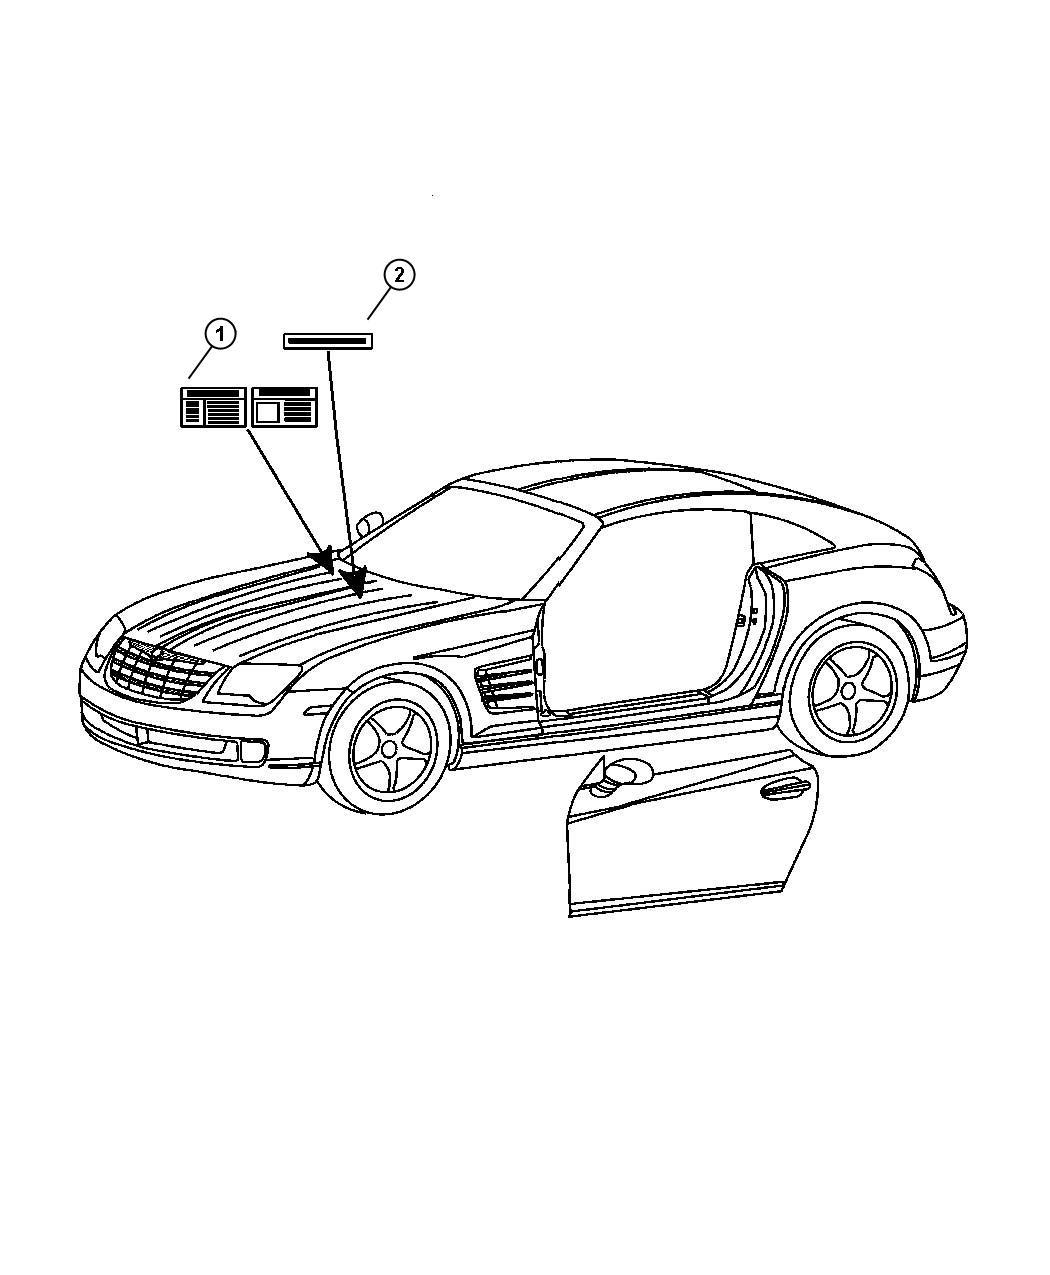 2010 Dodge Dakota Label. Emission. Charted on hood. Build